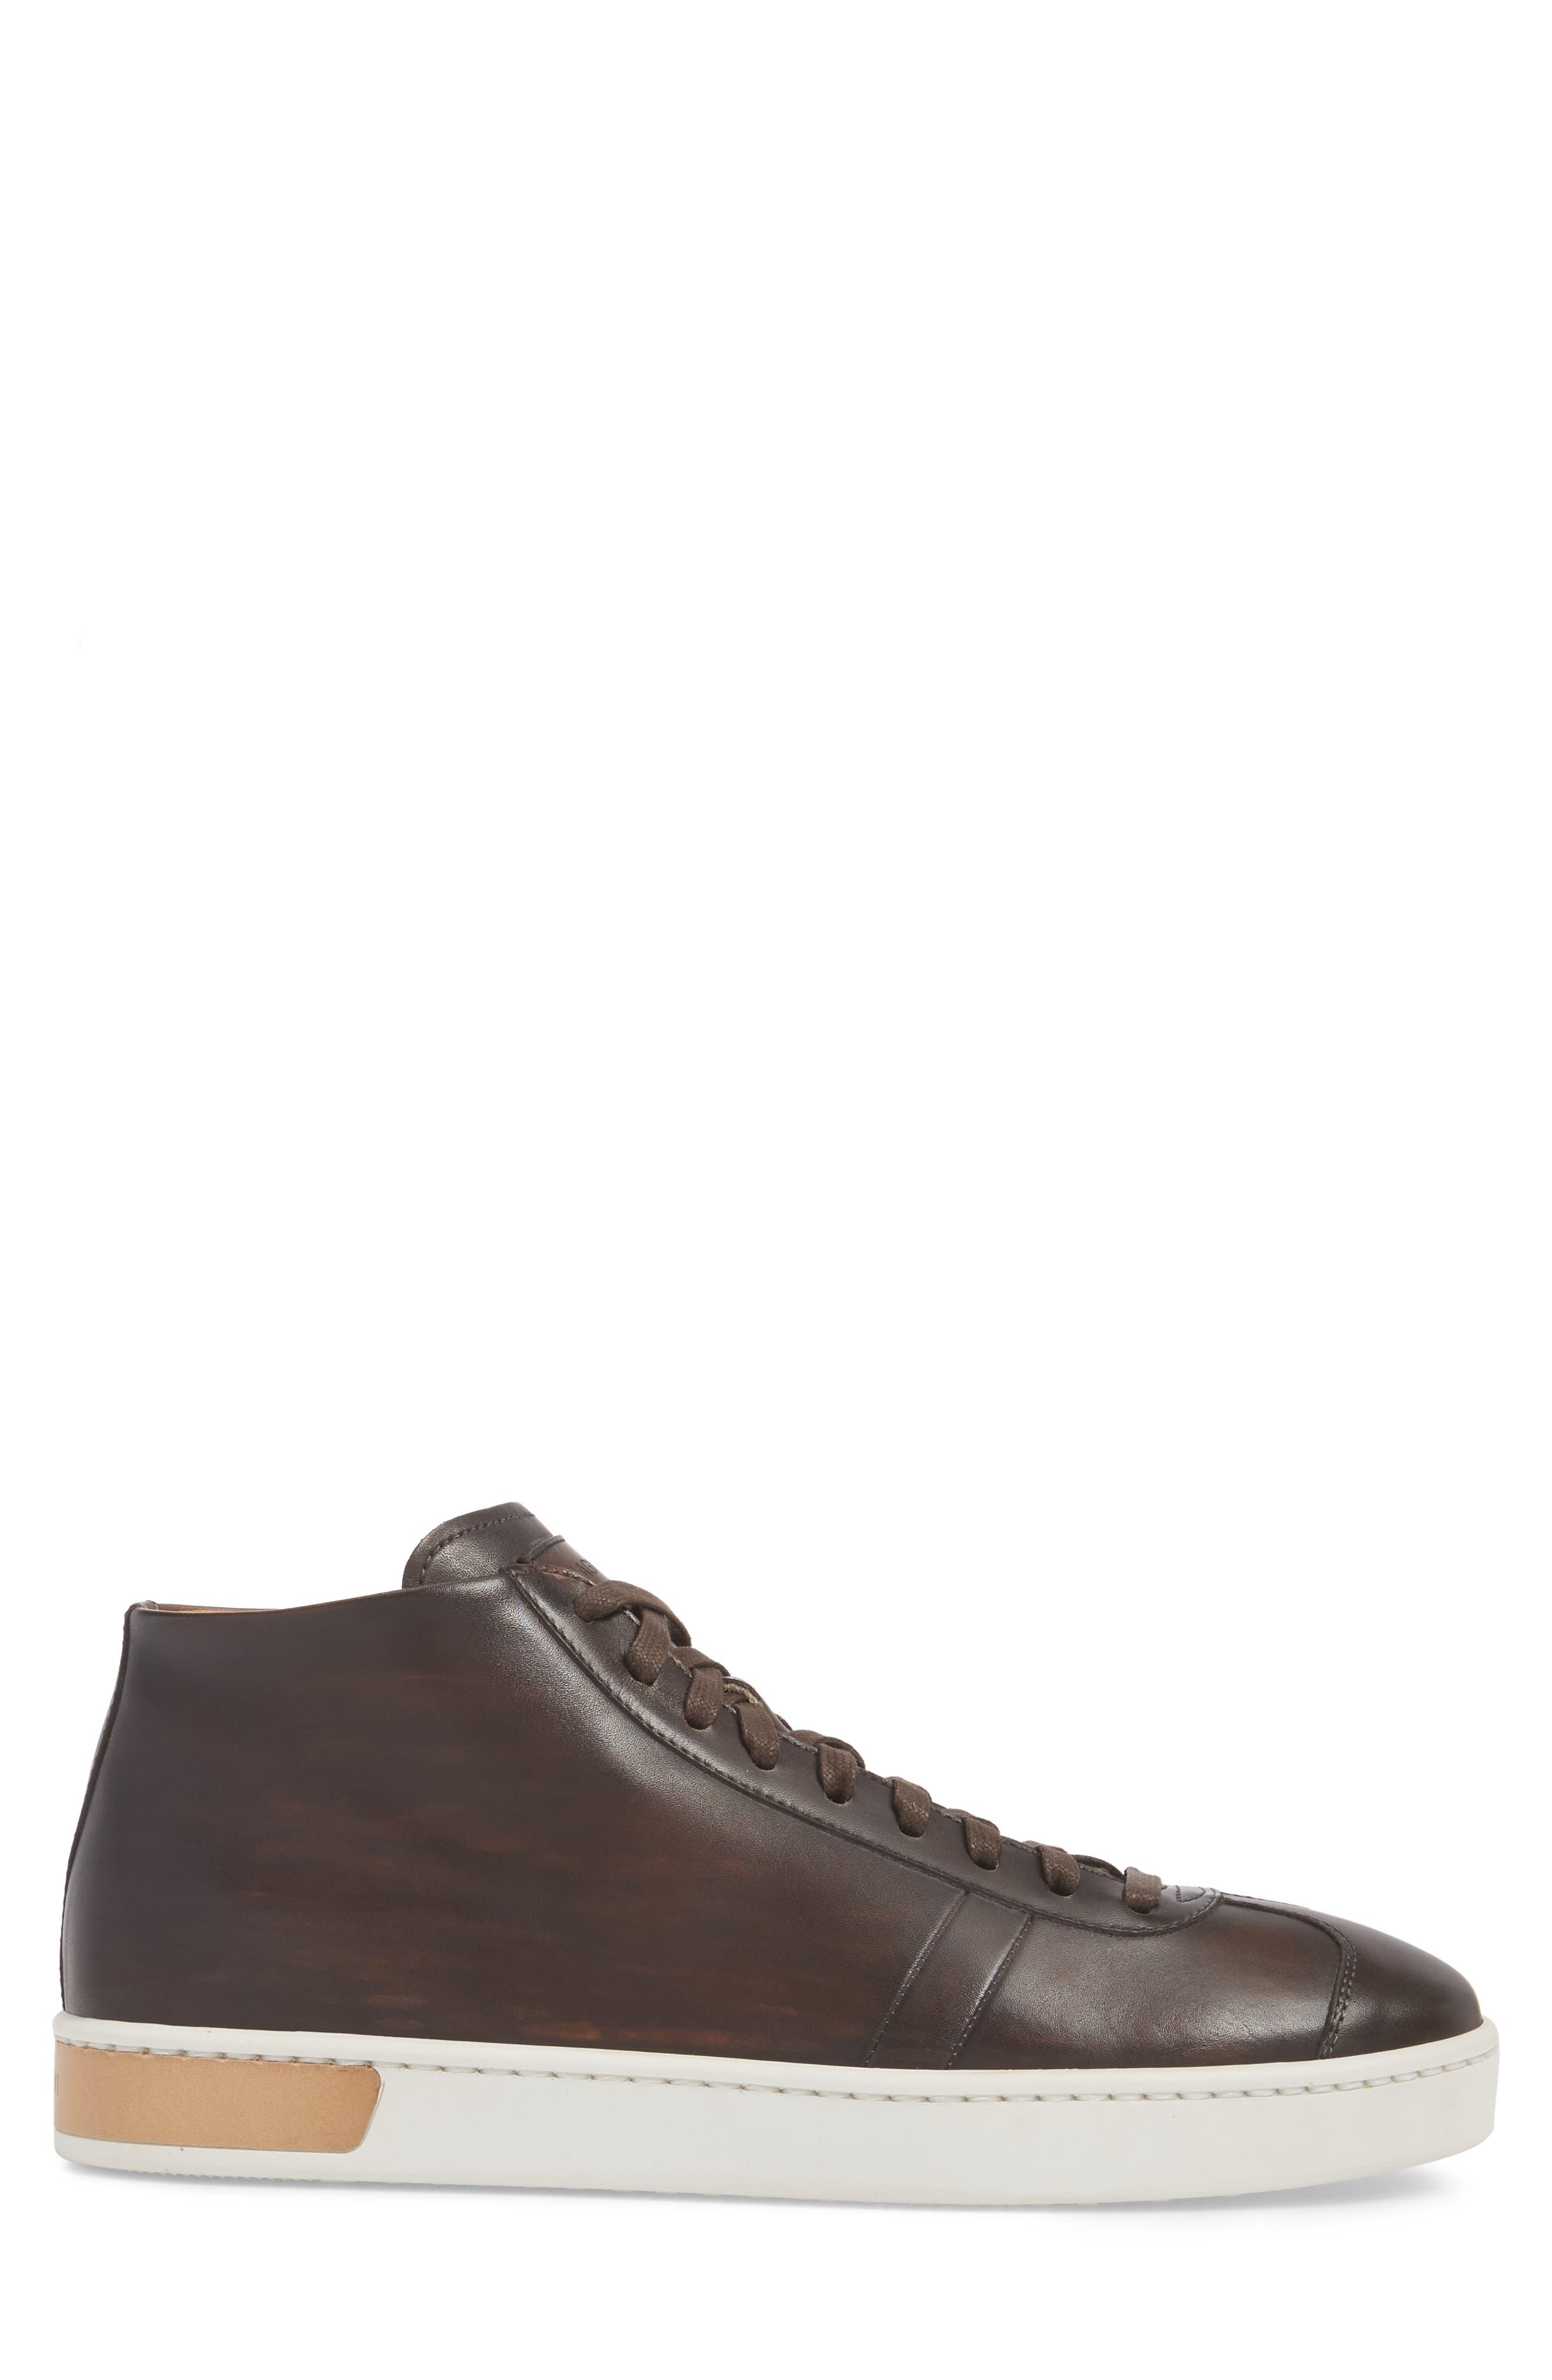 Gunner Mid Top Sneaker,                             Alternate thumbnail 3, color,                             Brown Leather